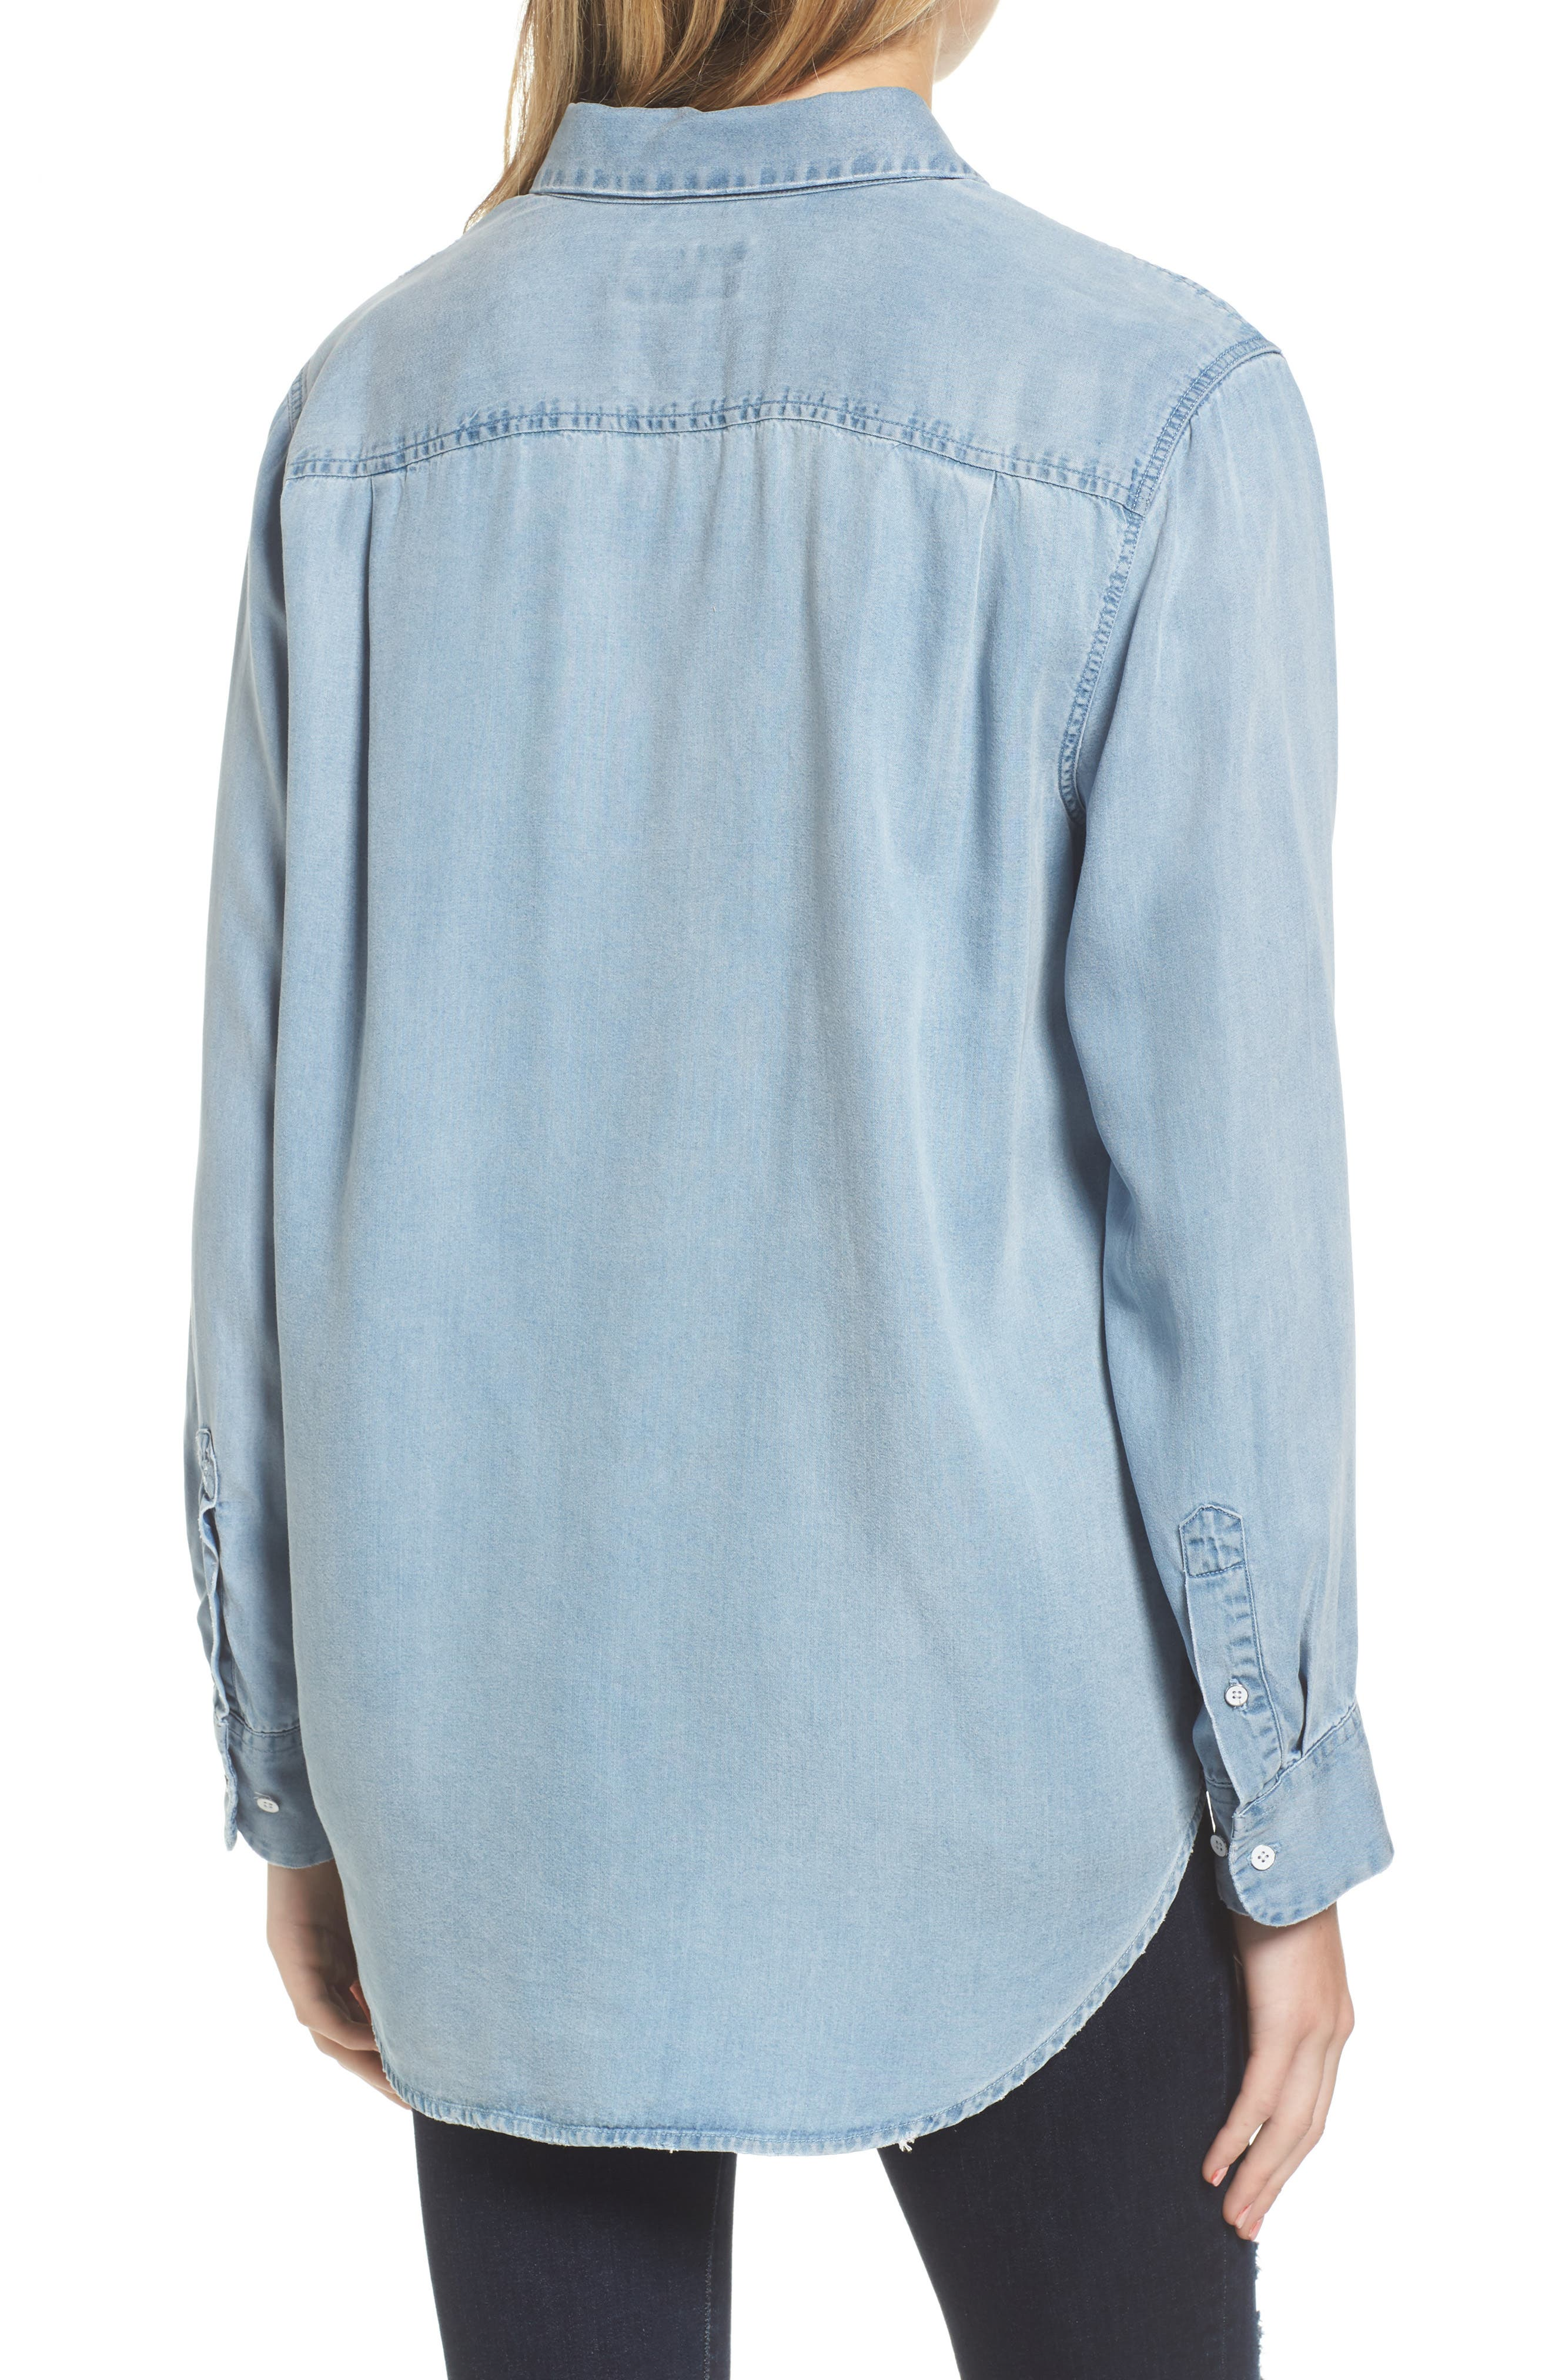 Alternate Image 2  - DL1961 x The Blue Shirt Shop Nassau & Manhattan Boyfriend Shirt